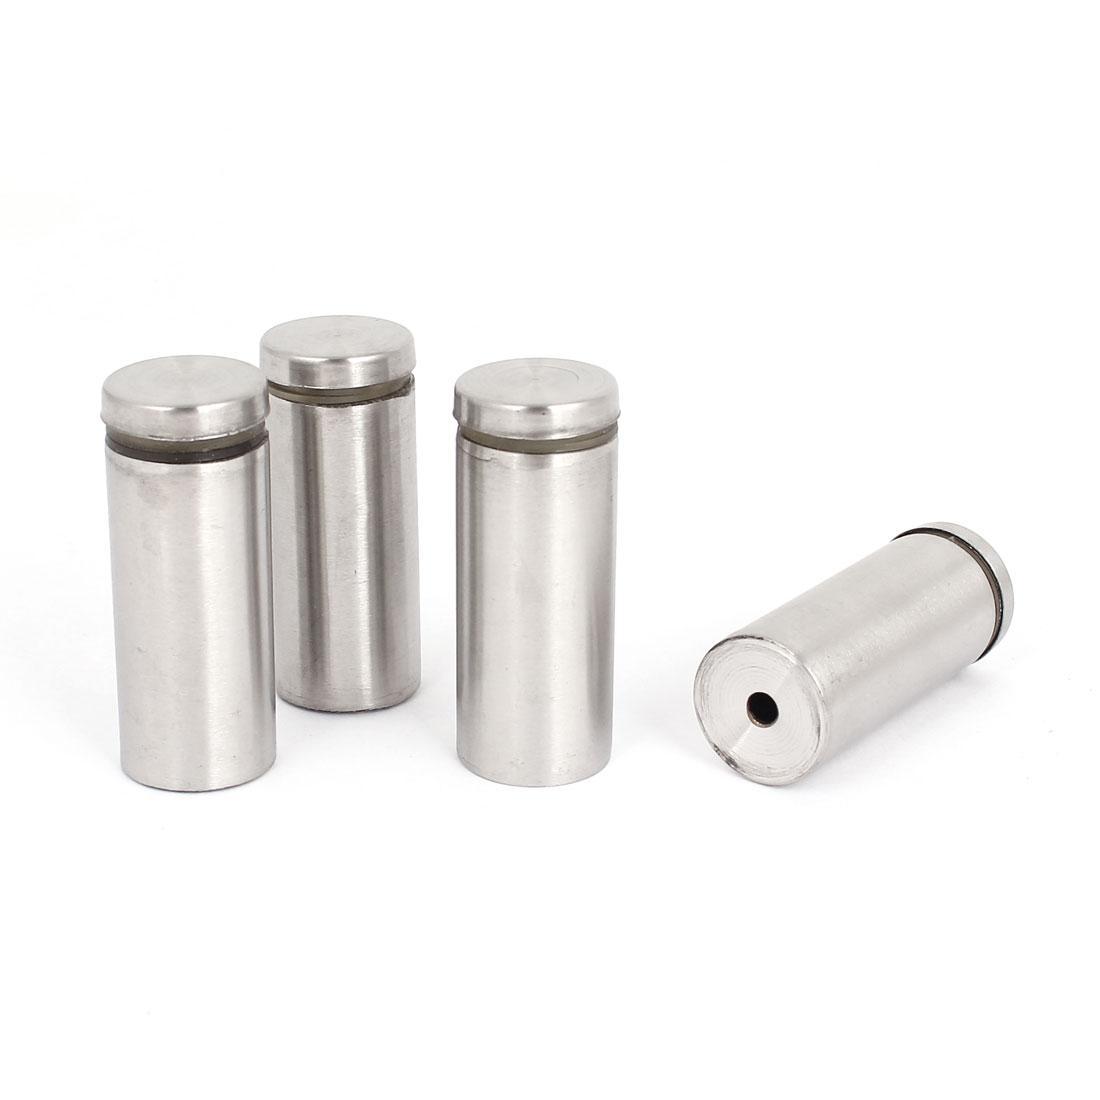 25mm x 60mm Stainless Steel Advertising Nails Frameless Glass Standoff 4 Pcs